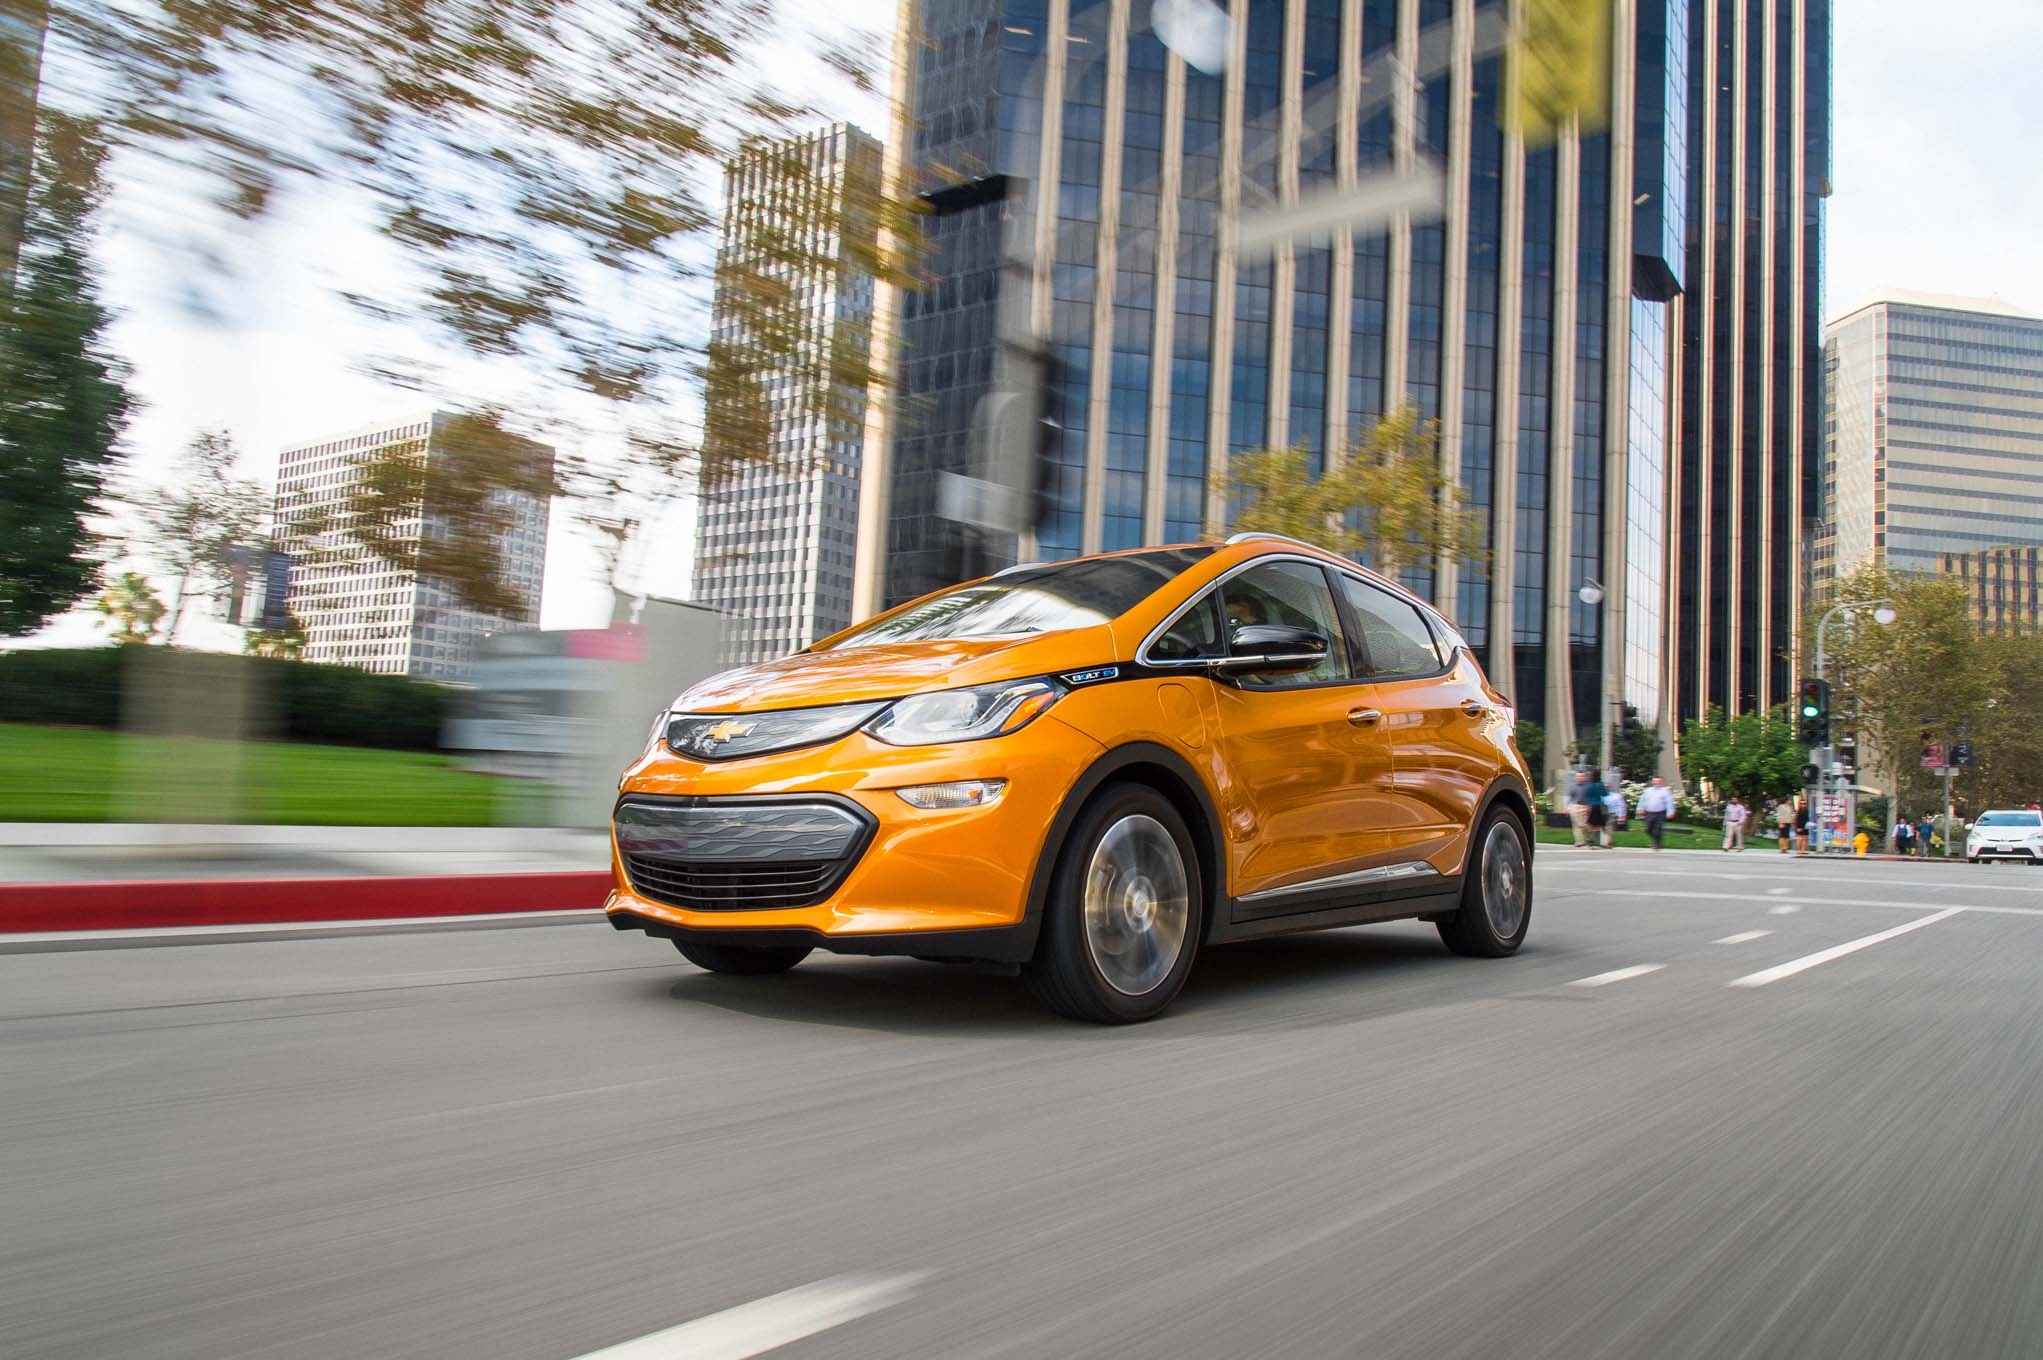 2017 Chevrolet Bolt EV Front Three Quarter In Motion